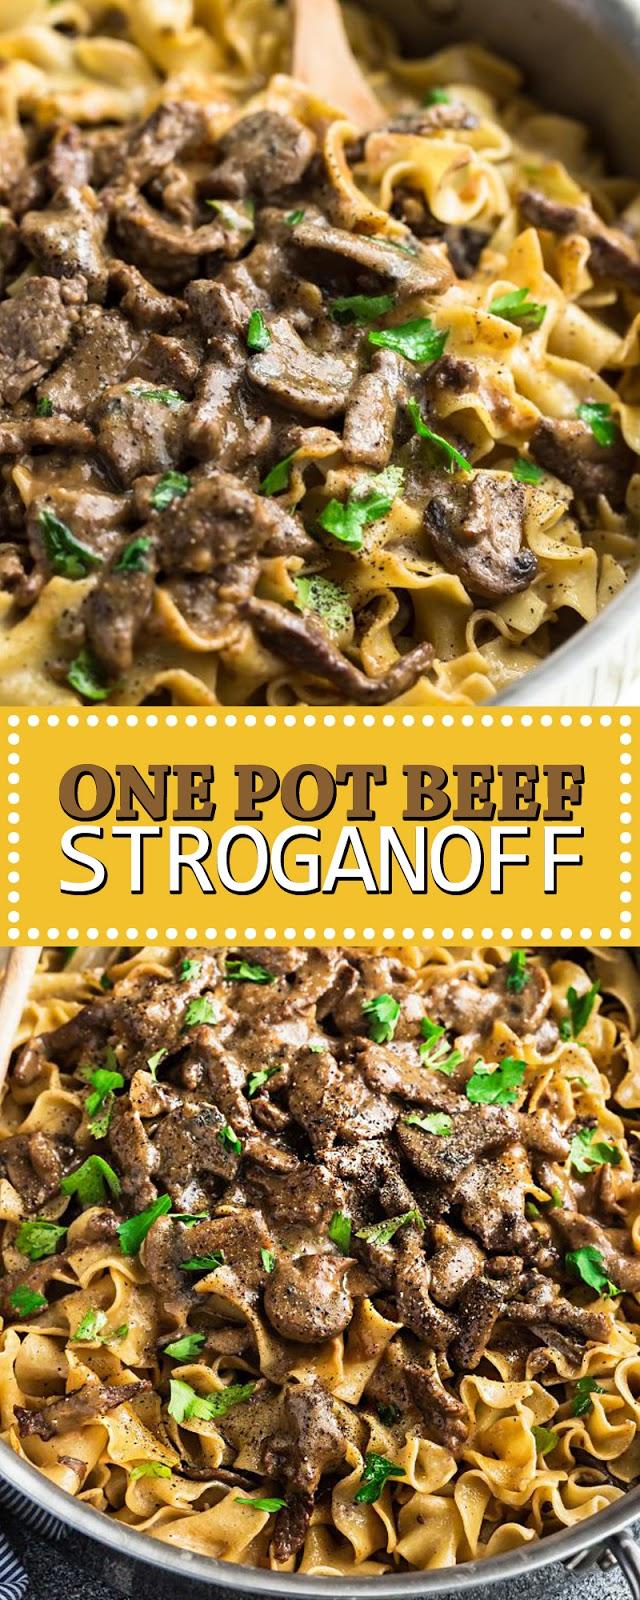 ONE POT BEEF STROGANOFF